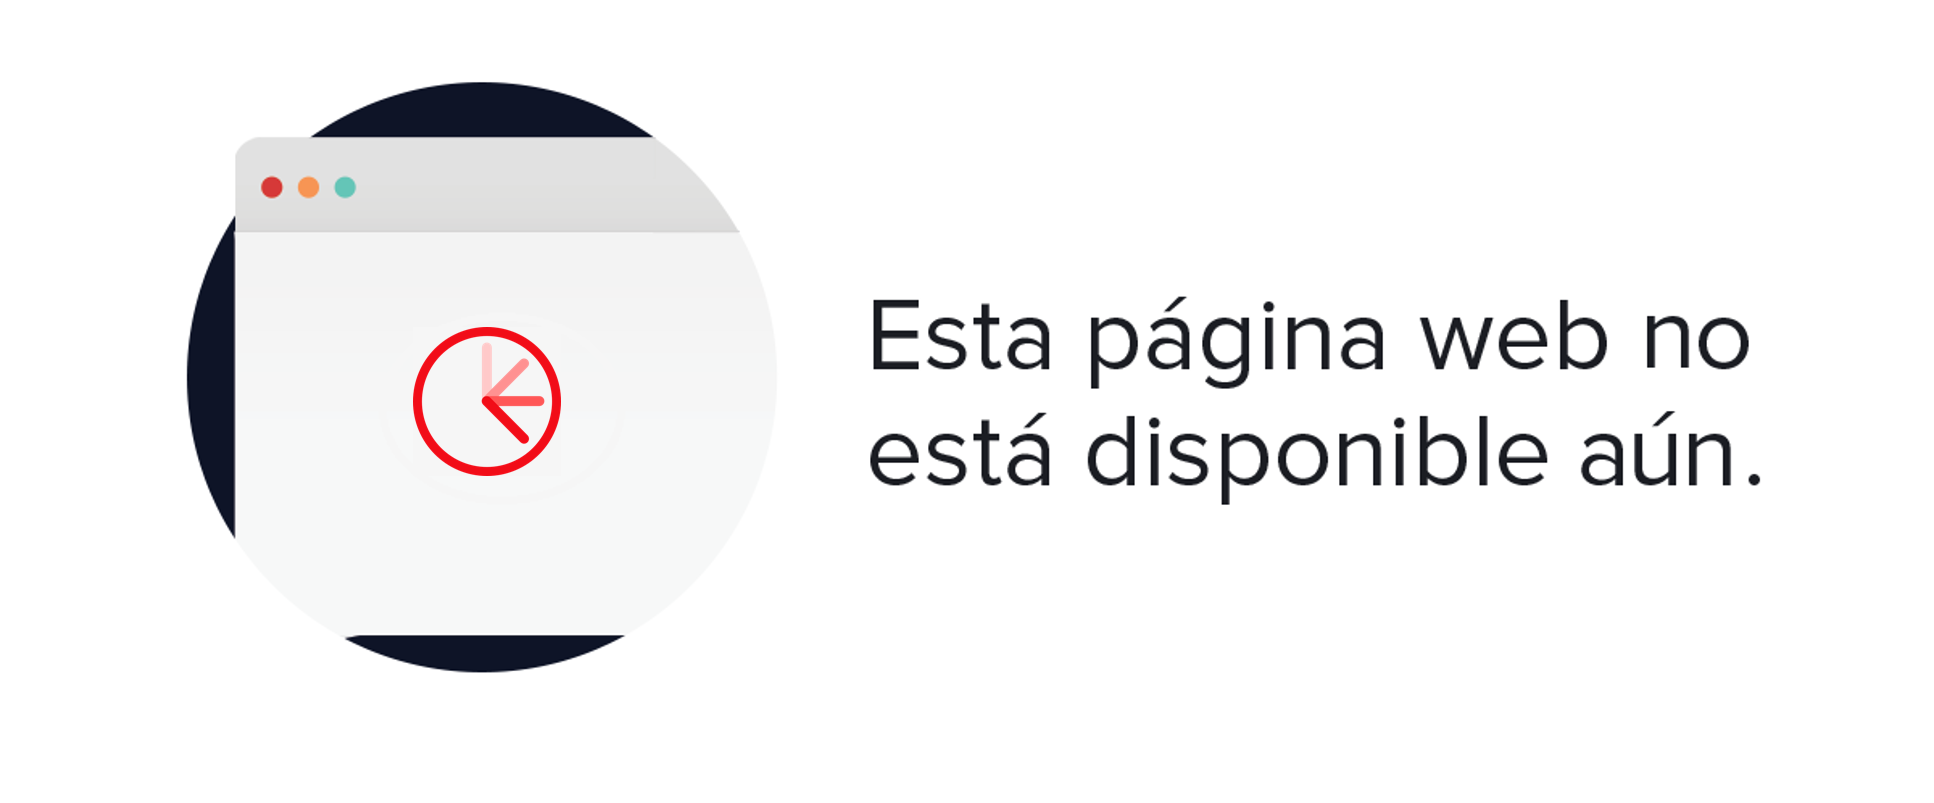 Adolfo Dominguez - Pantalón de mujer Adolfo Dominguez azul marino recto Azul marino 8433917424027 - AILTSPX